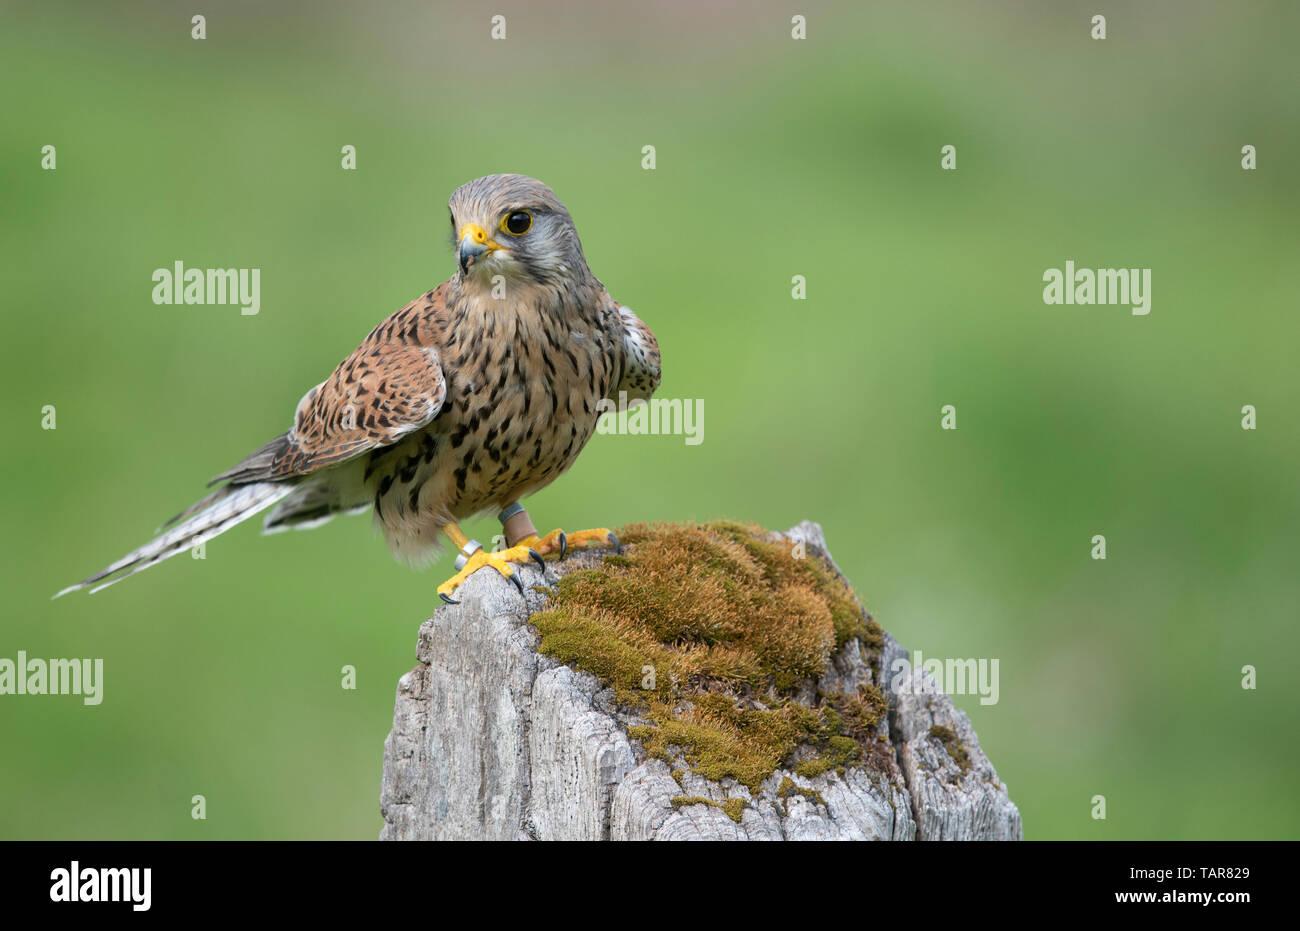 Female kestrel (Falco tinnunculus) on gatepost - Stock Image